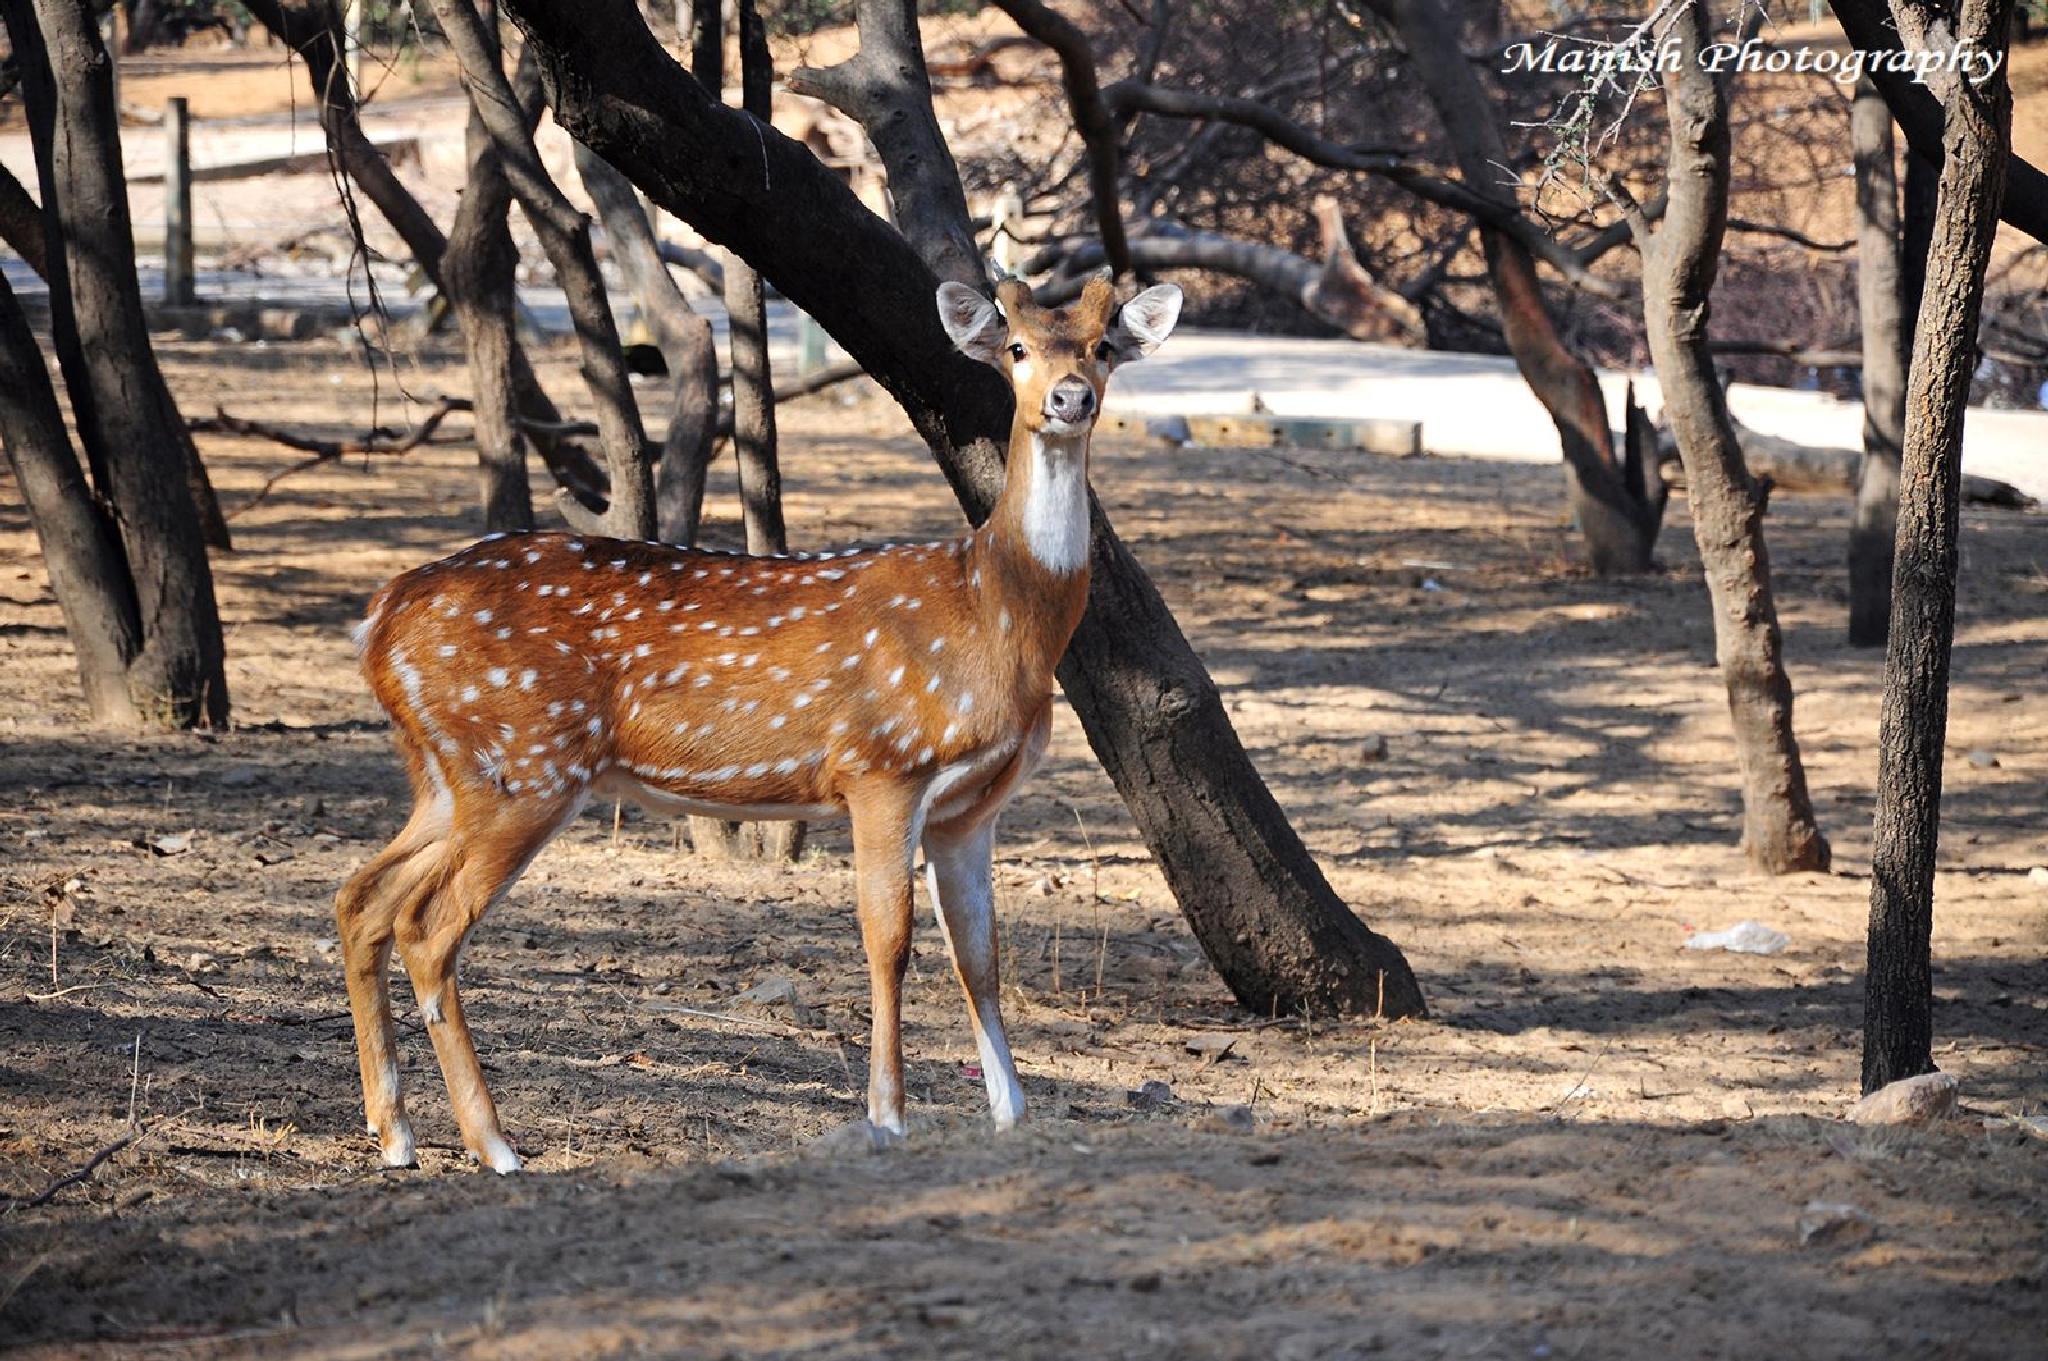 Deer in Jhalana Forest Jaipur, India  by Maneesh Sharma